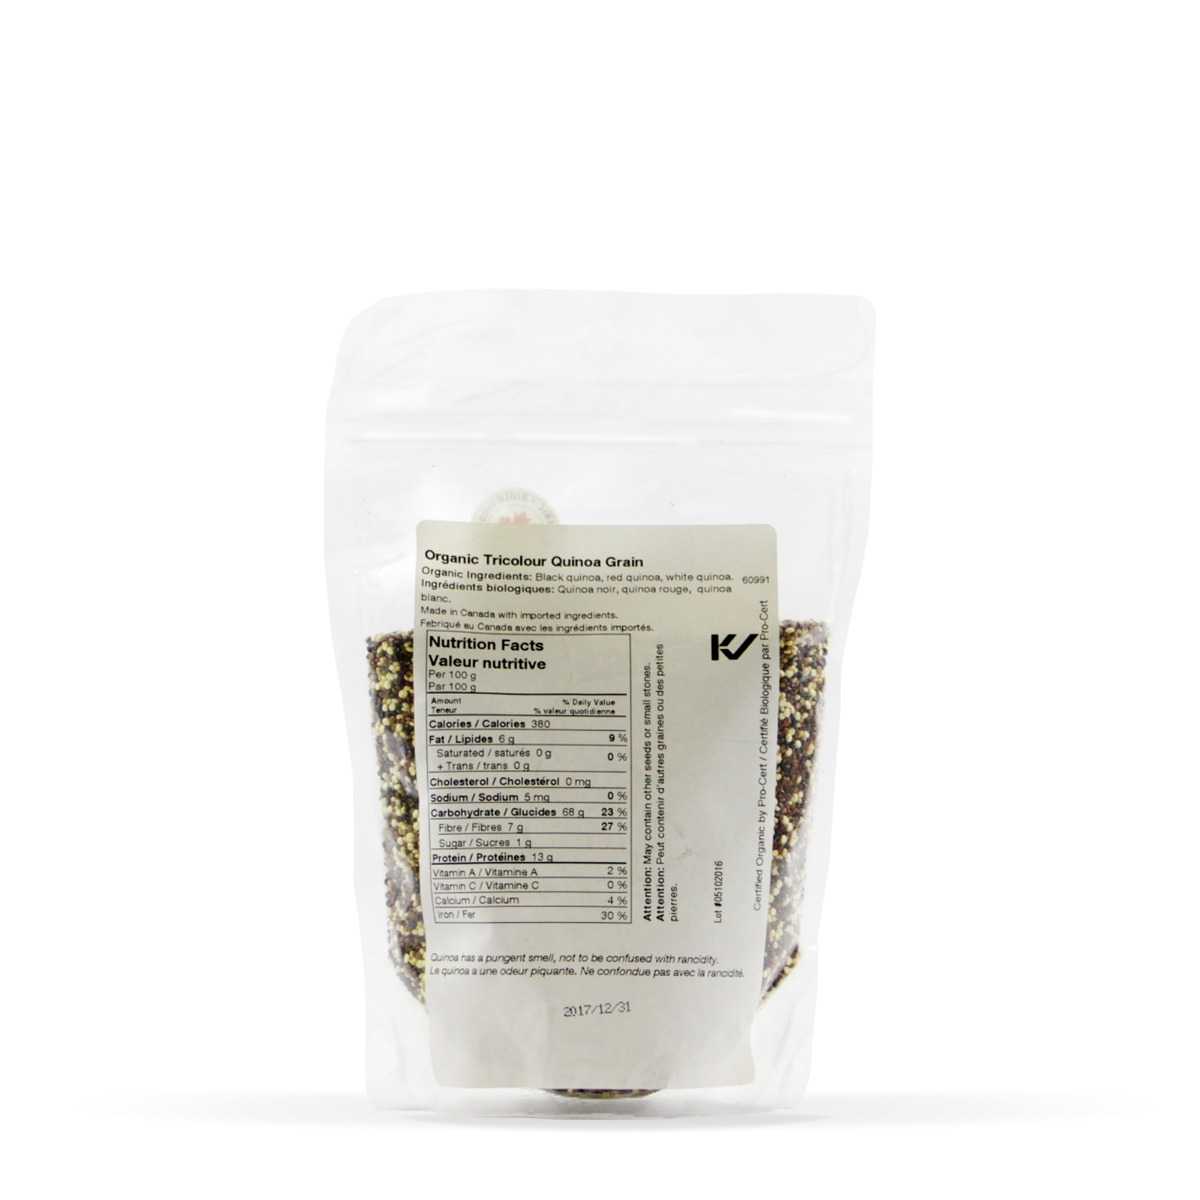 Nutritional Information About Real • Organic Tricolour Quinoa Grain